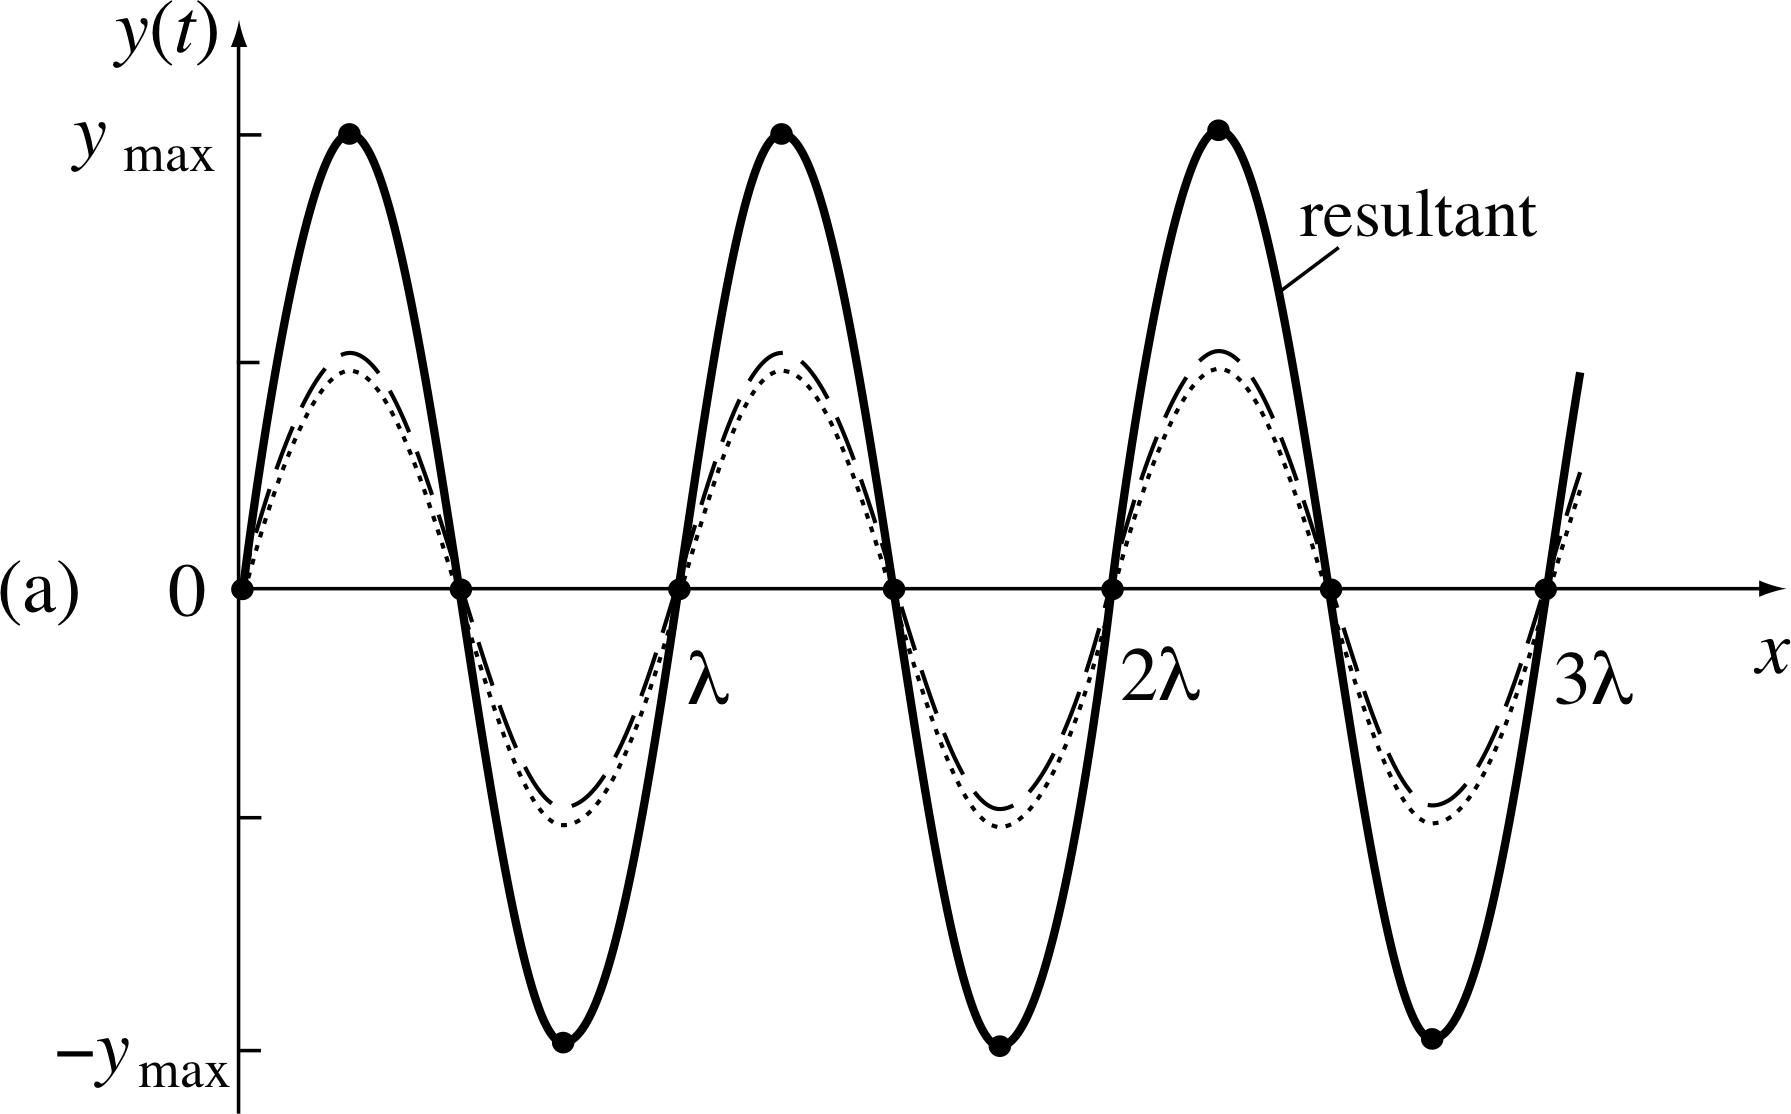 Pplato Flap Phys 61 Light A Wave Phenomenon Radio Waves Diagram Showing Flow Of Figure